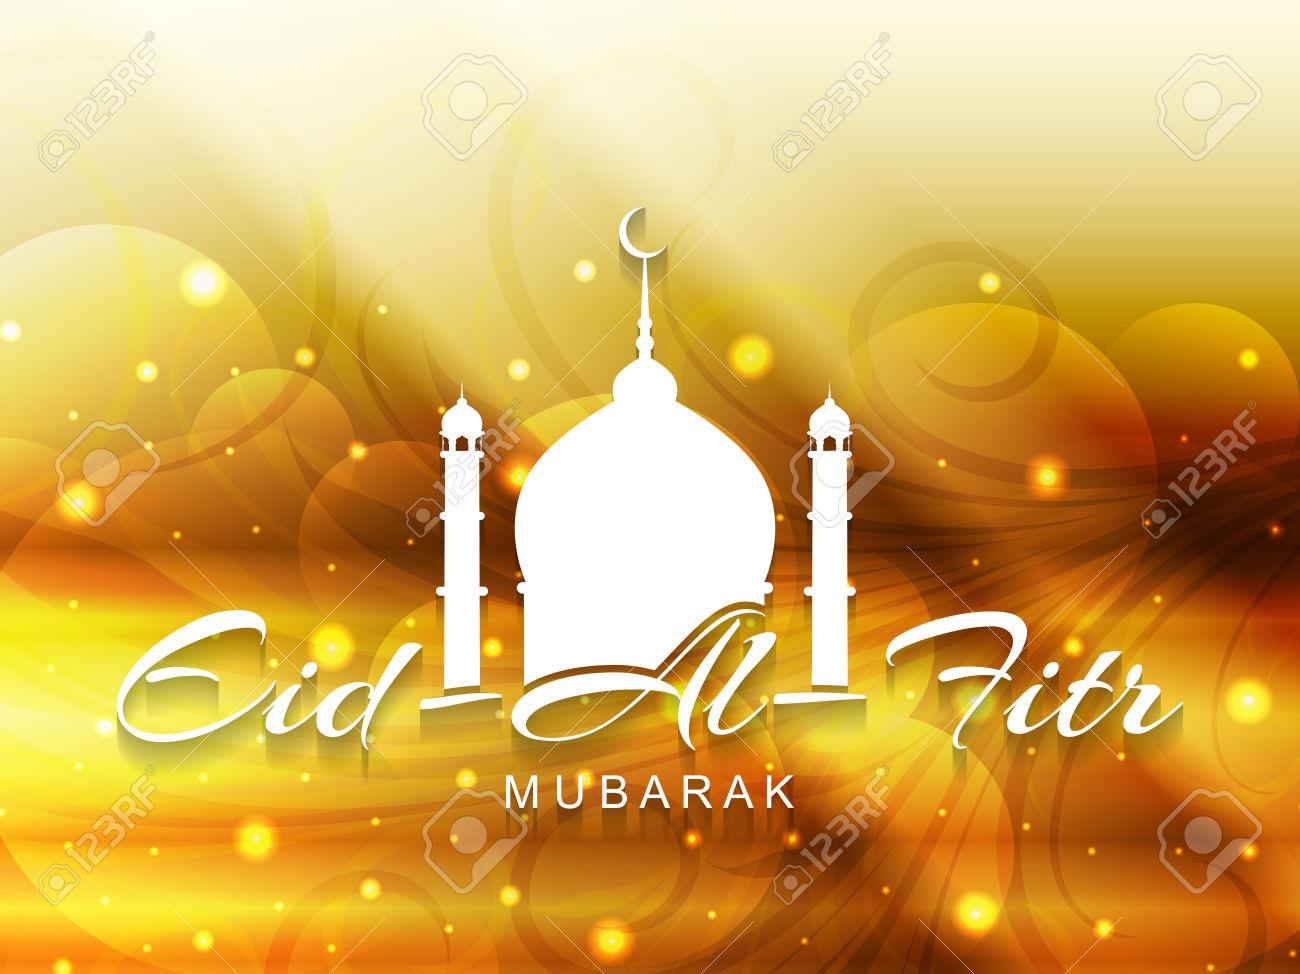 Best New Eid Al-Fitr Greeting - Eid-Ul-Fitr-Mubarak-HD-Wishes-Picture  Gallery_11438 .jpg